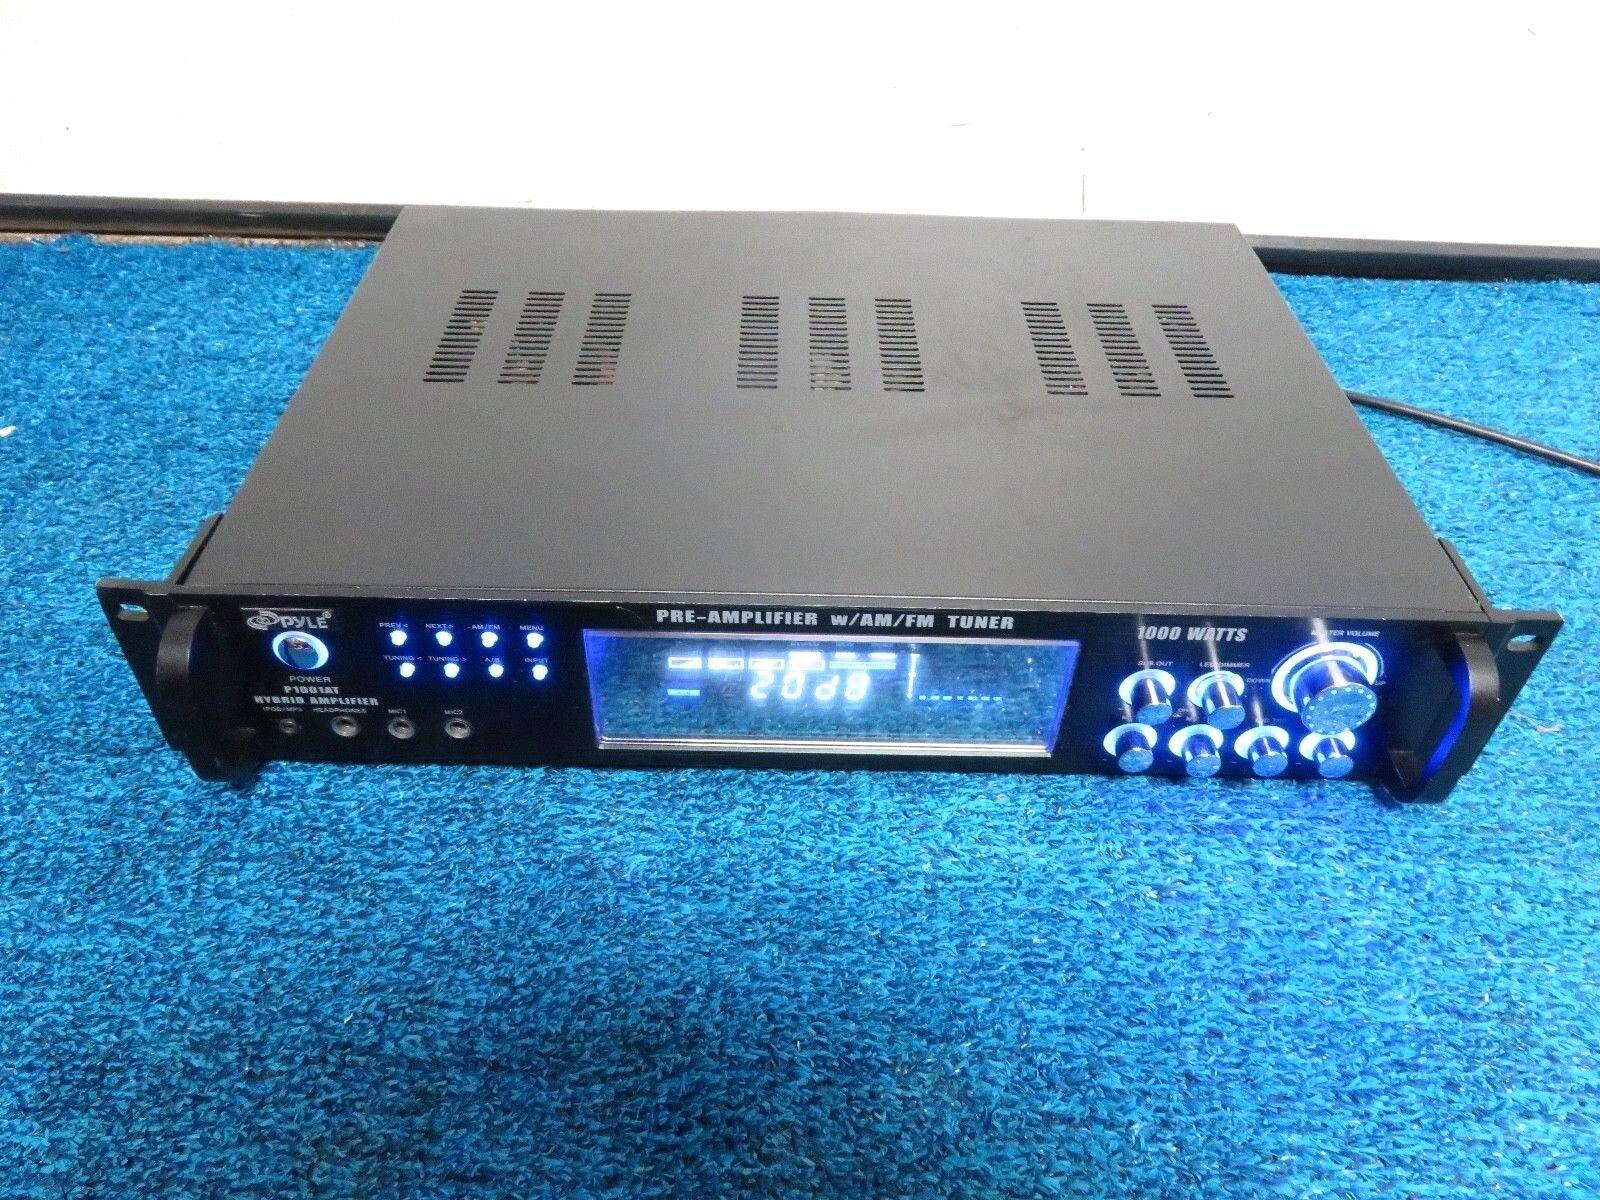 Pyle Am Fm Tuner Hybrid Pre Amplifier P1001AT 1000 Watt MP3 AUX MIC P&R